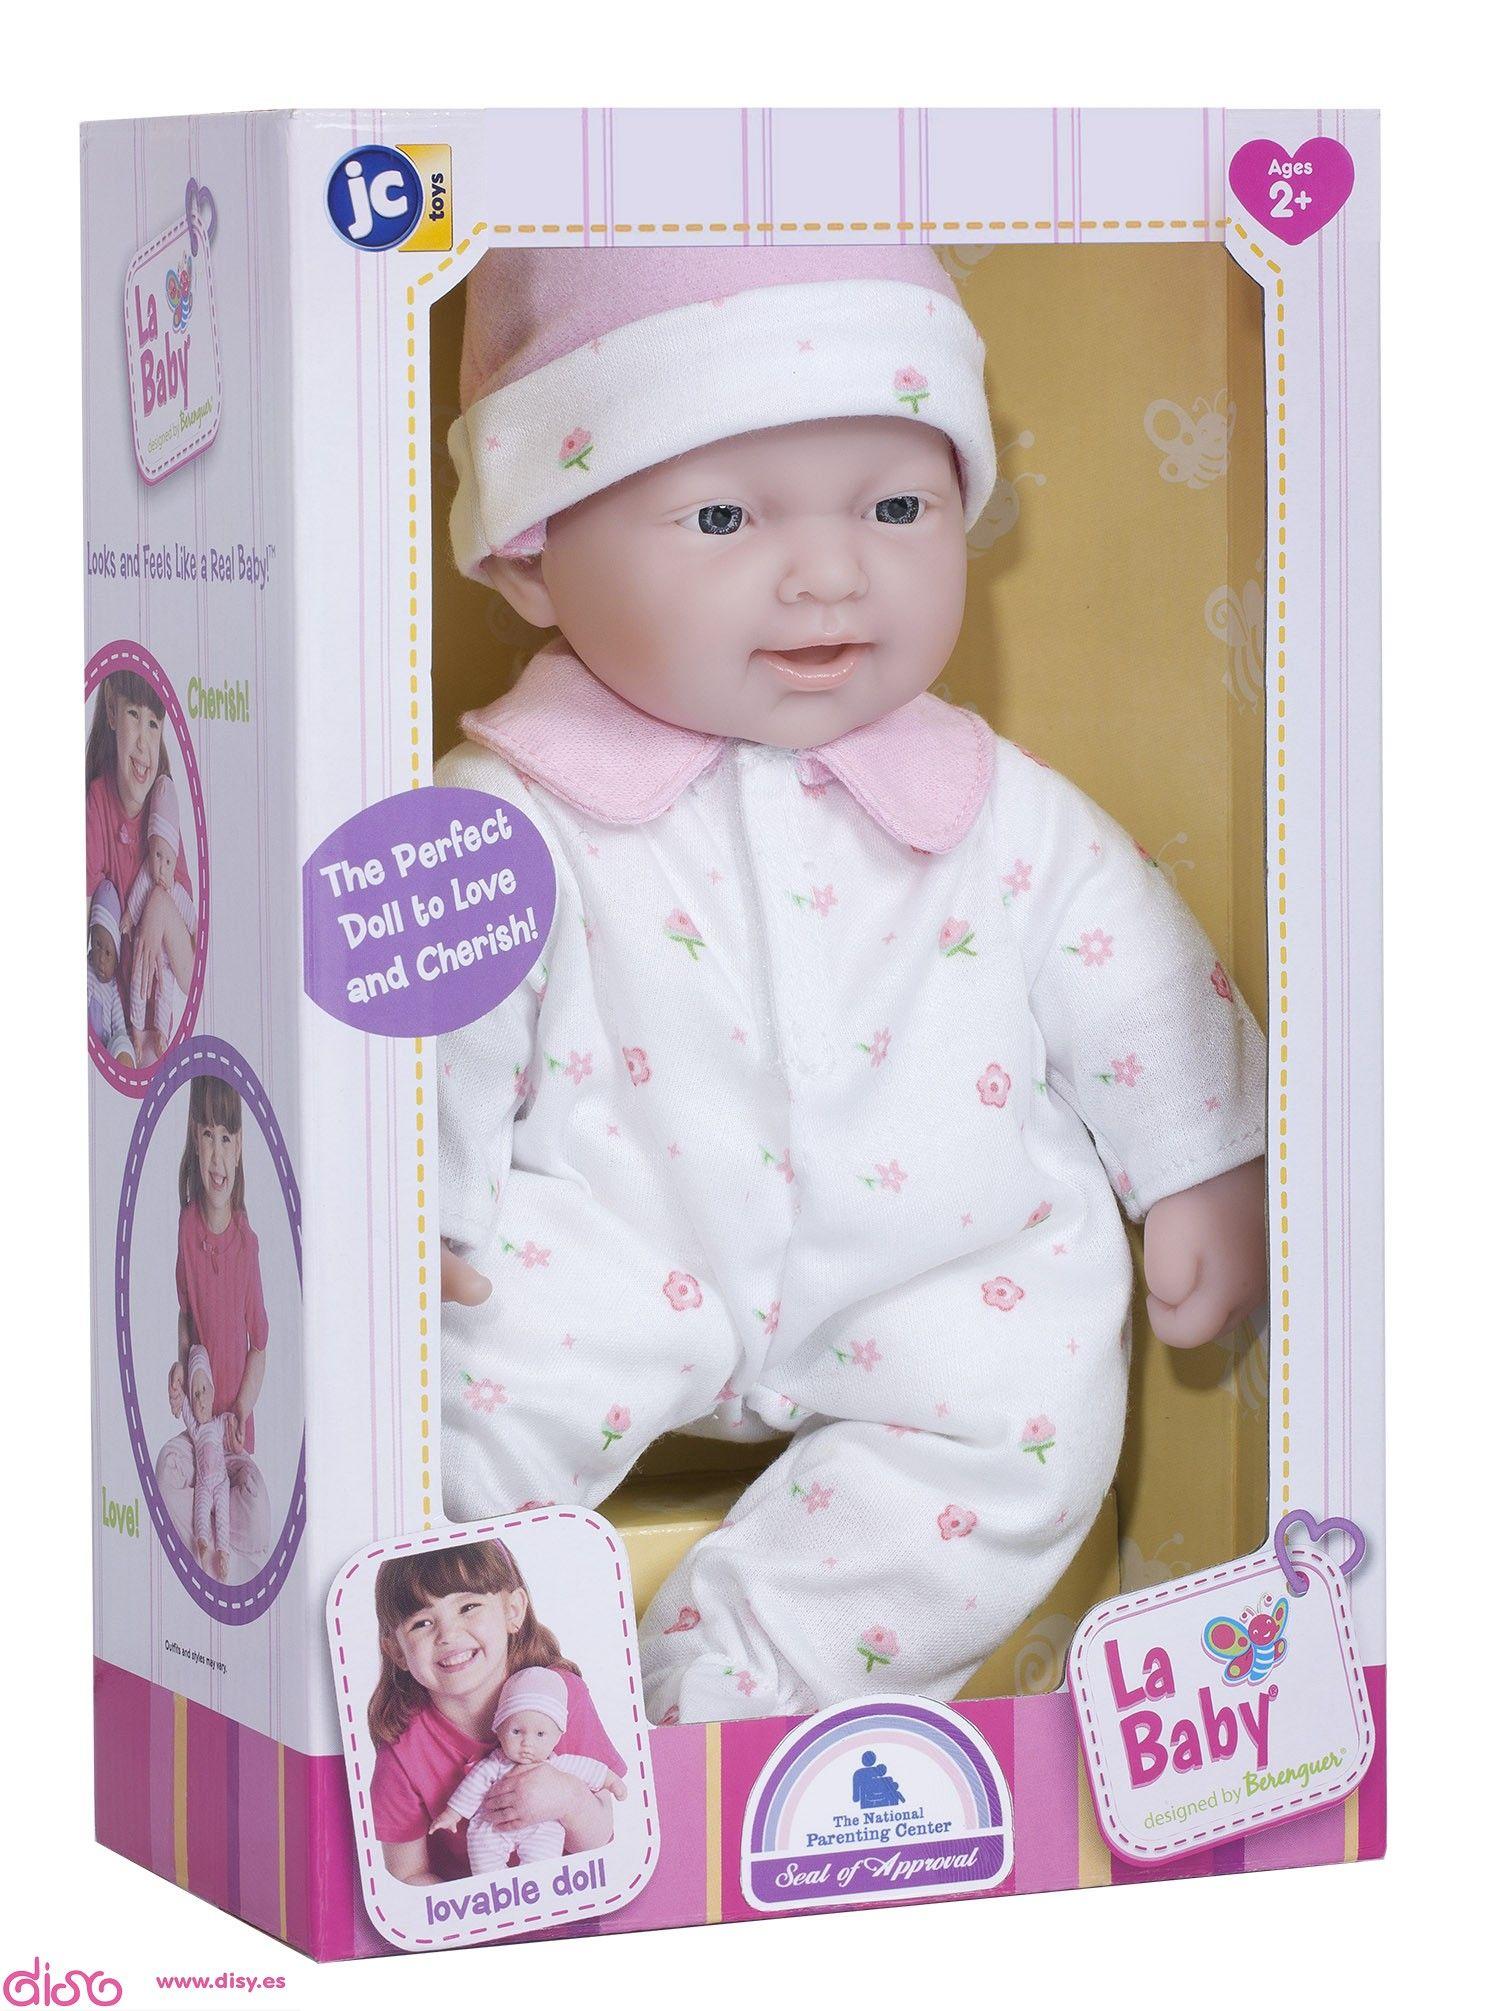 muñecasberenguer berenguerdolls muñecasbebesdisy munecas bebés